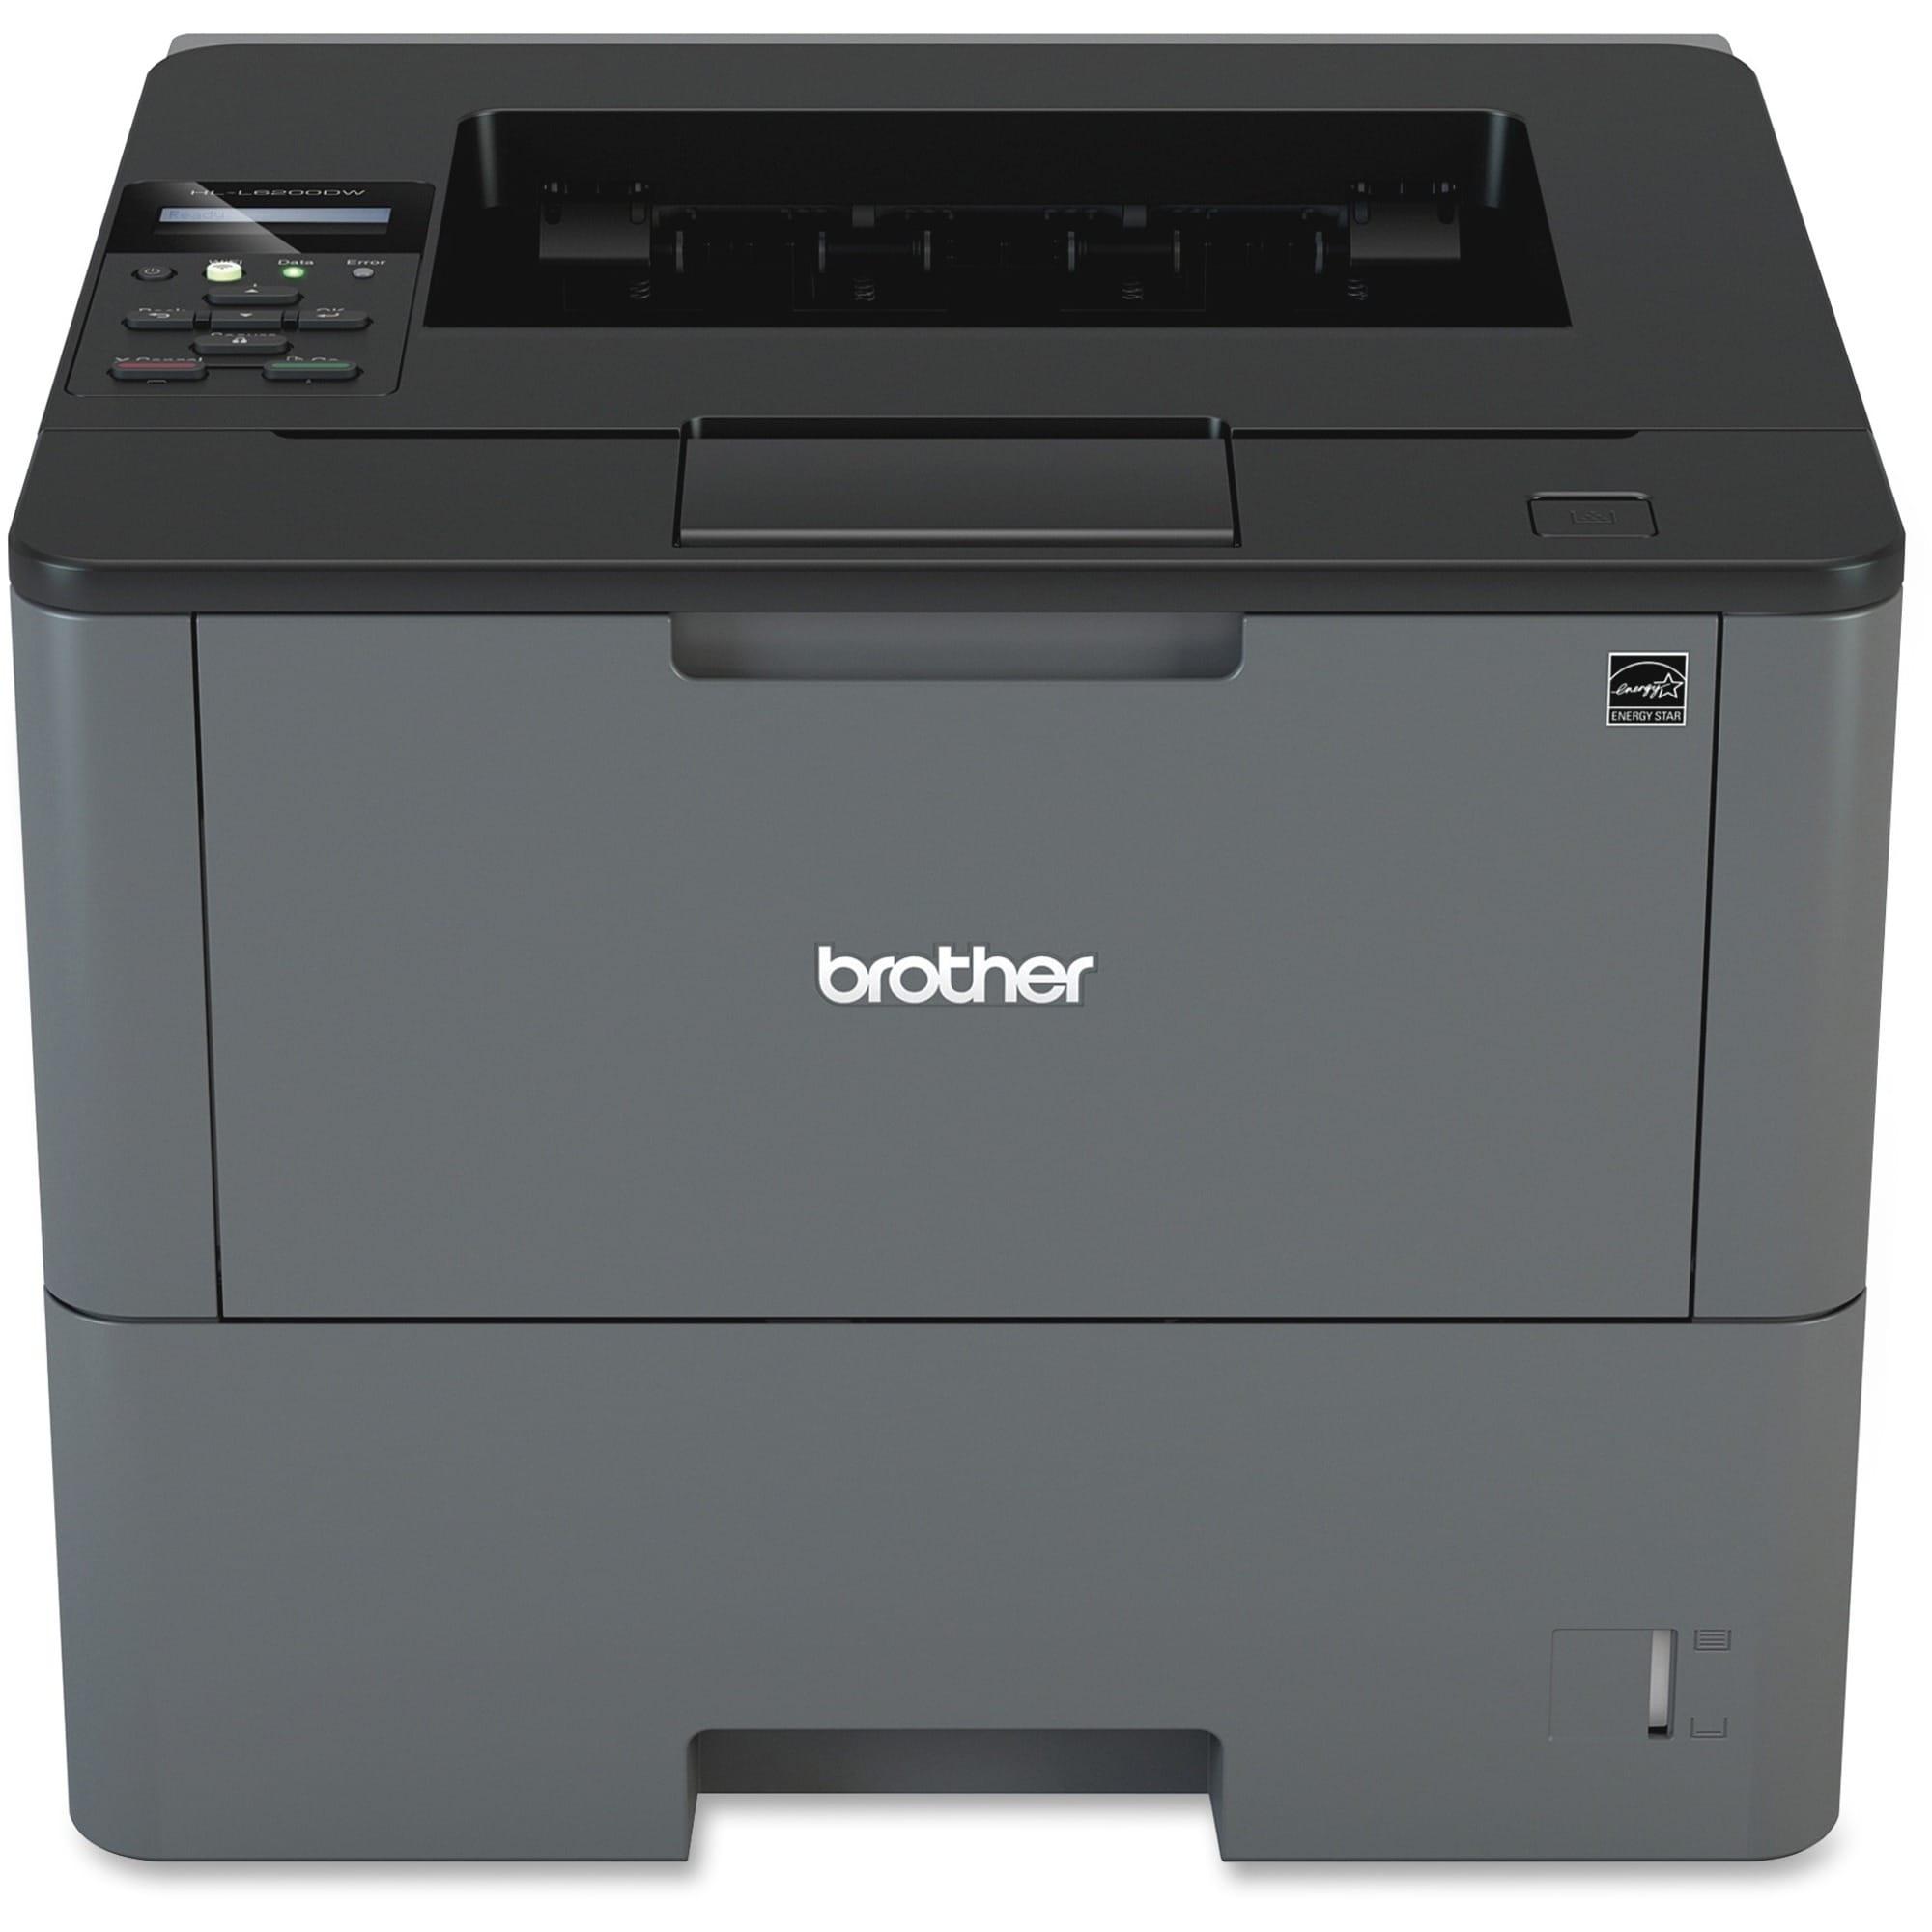 Brother HL-L6200DW Laser Printer - Monochrome - 1200 x 1200 dpi Print